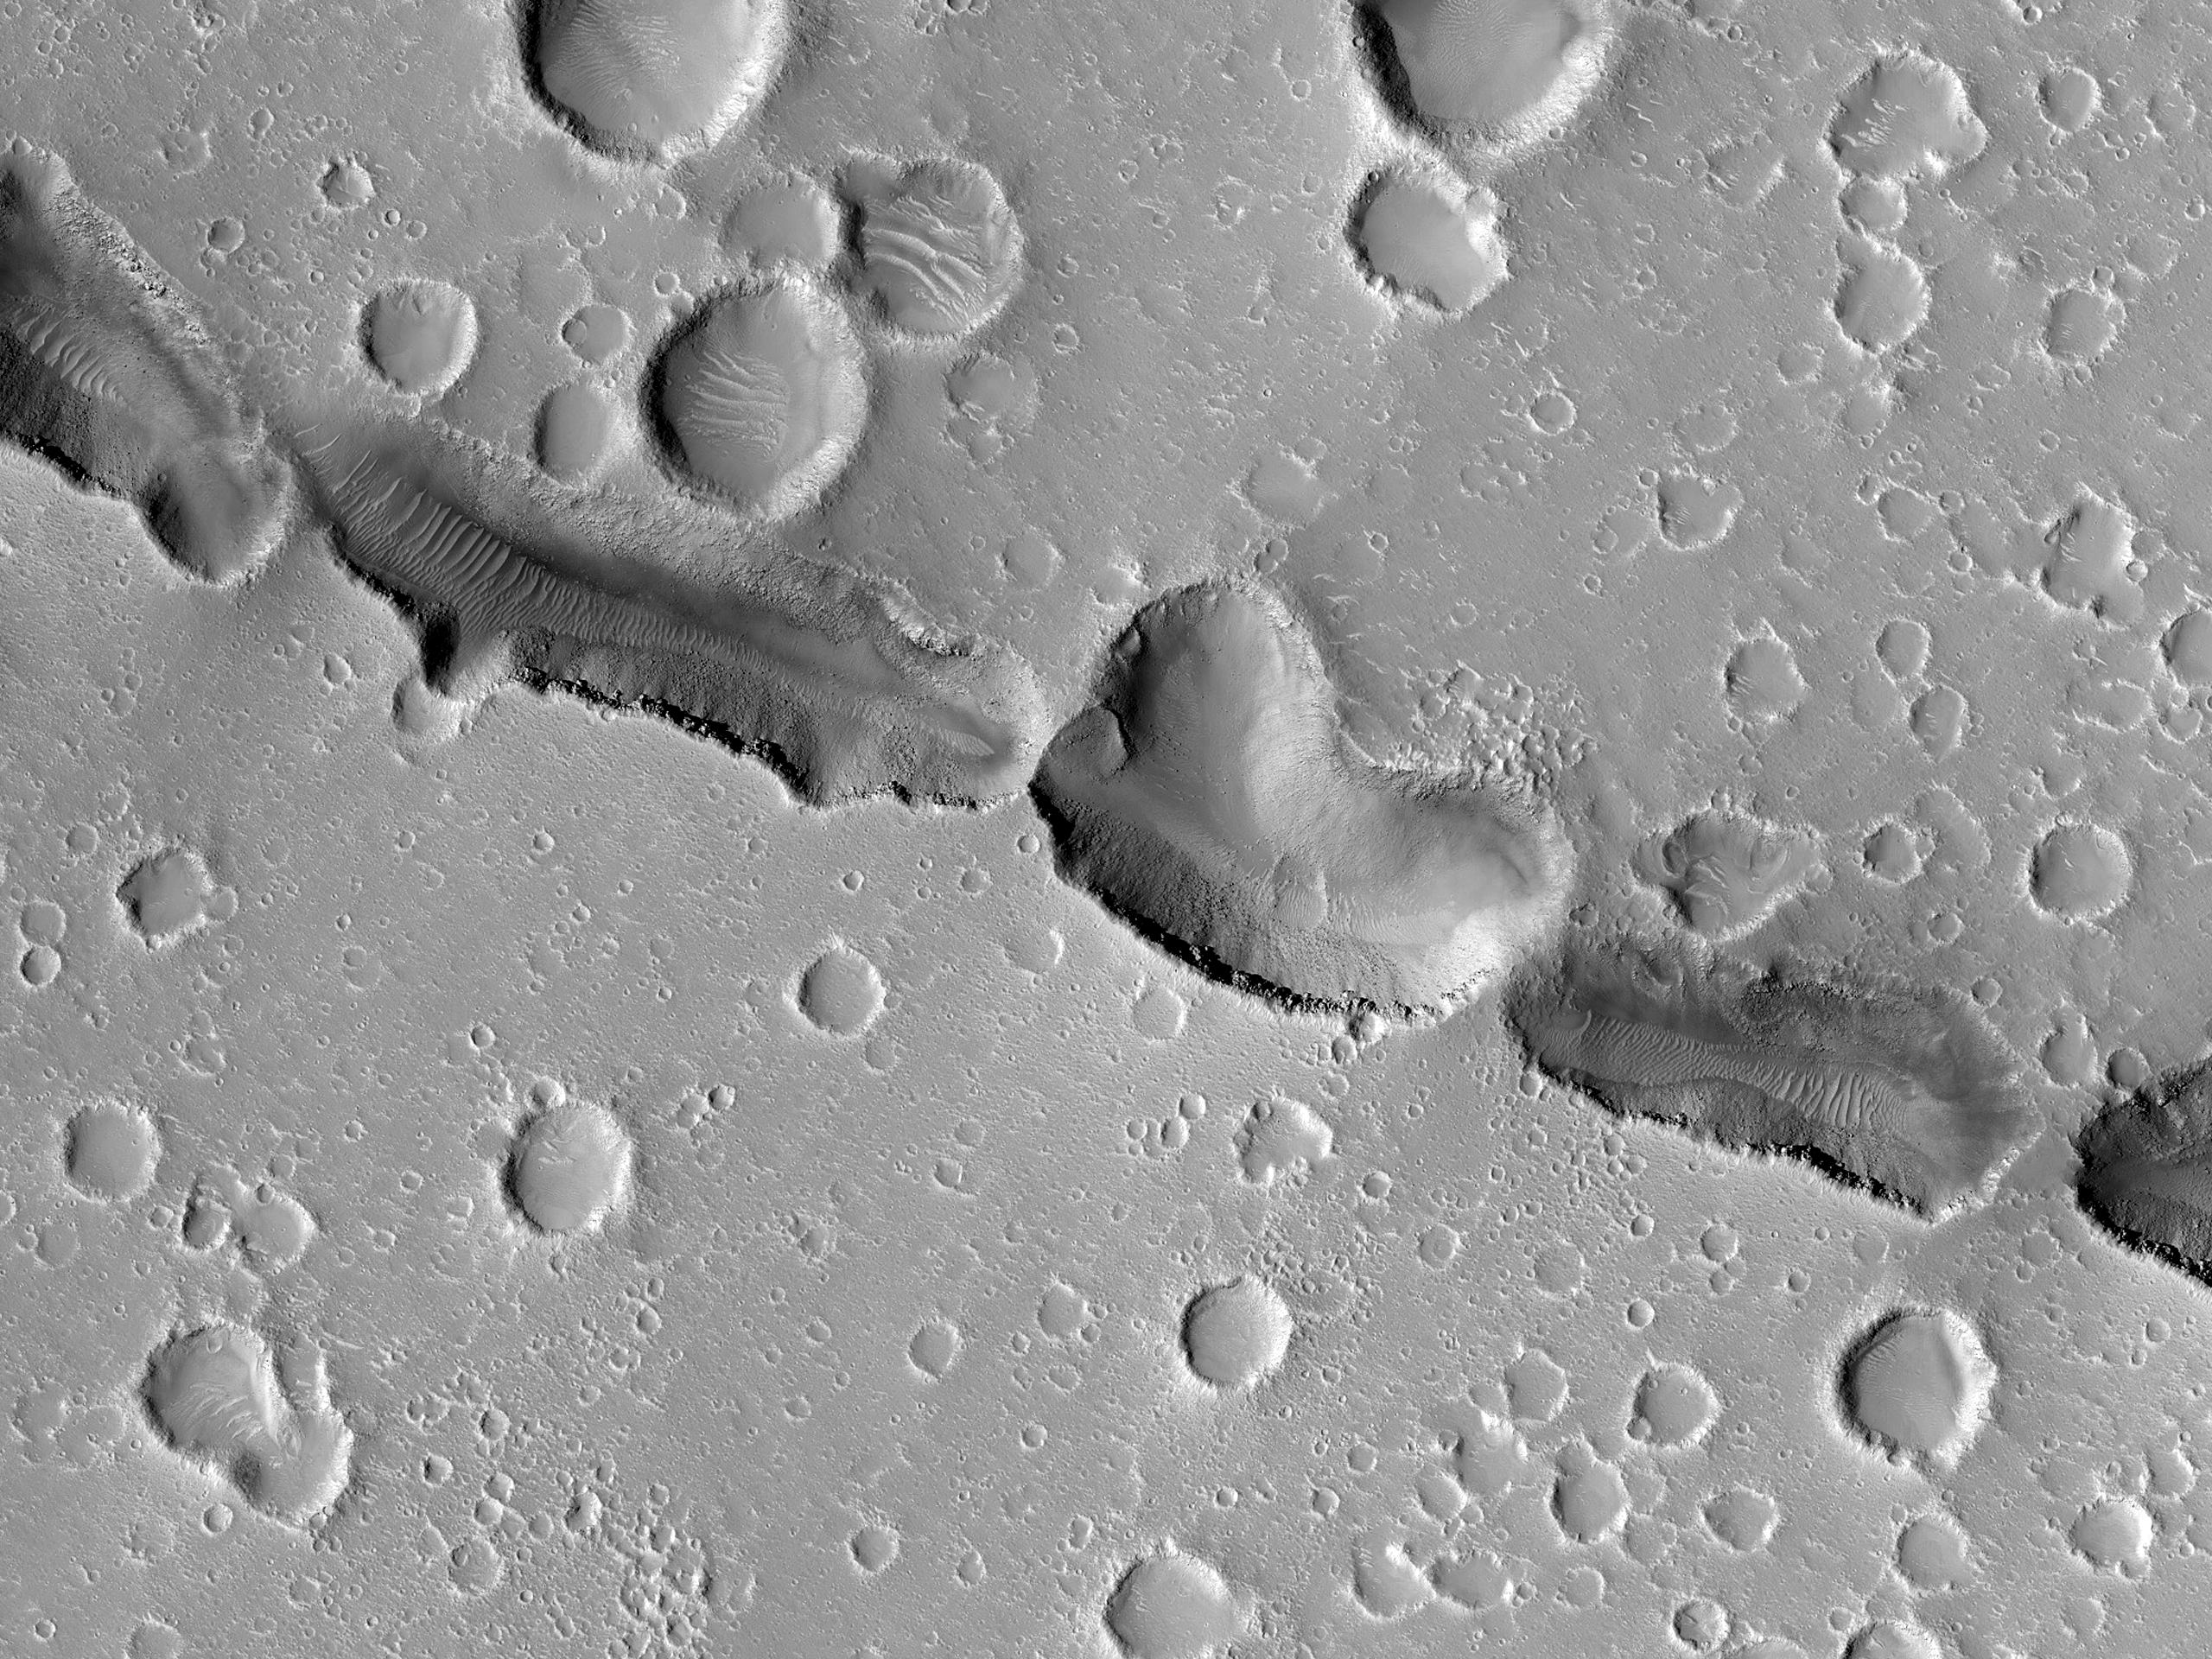 Hephaestus Fossae Pits